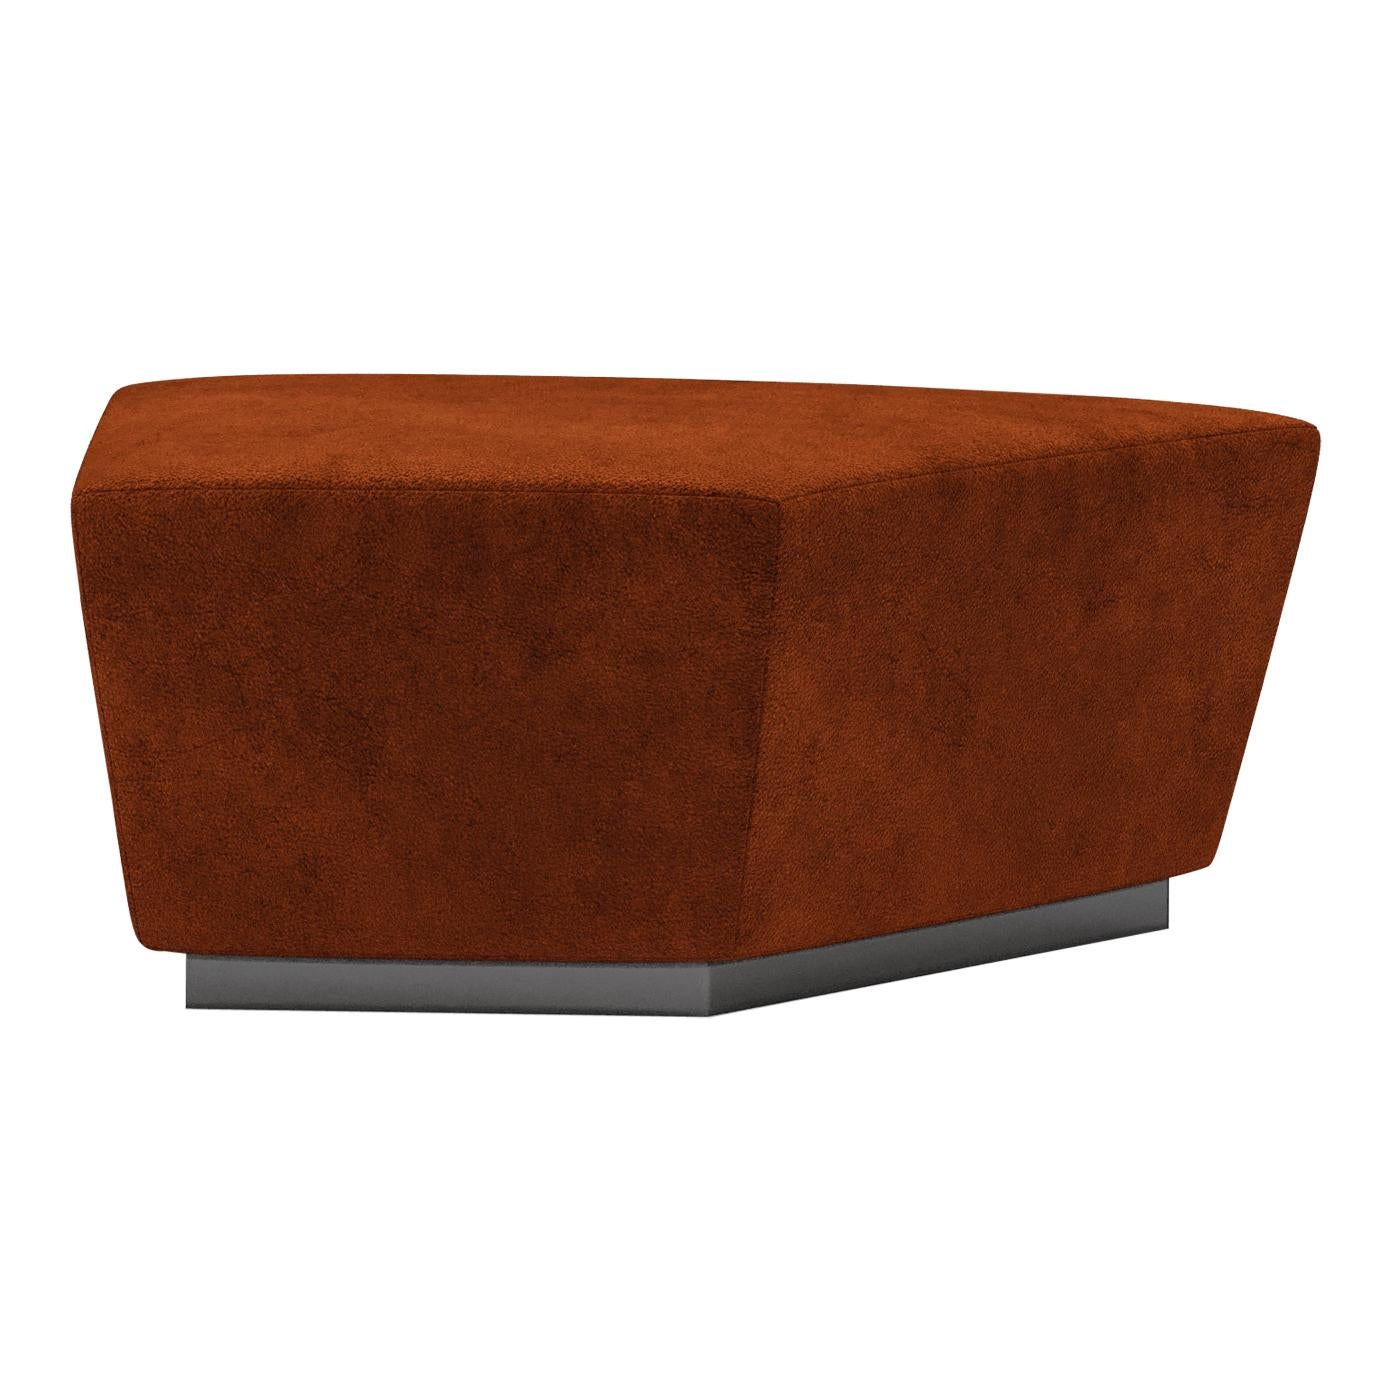 Pouf Element Contemporary Modular Sofa by Fabio Arcaini Settee Velvet